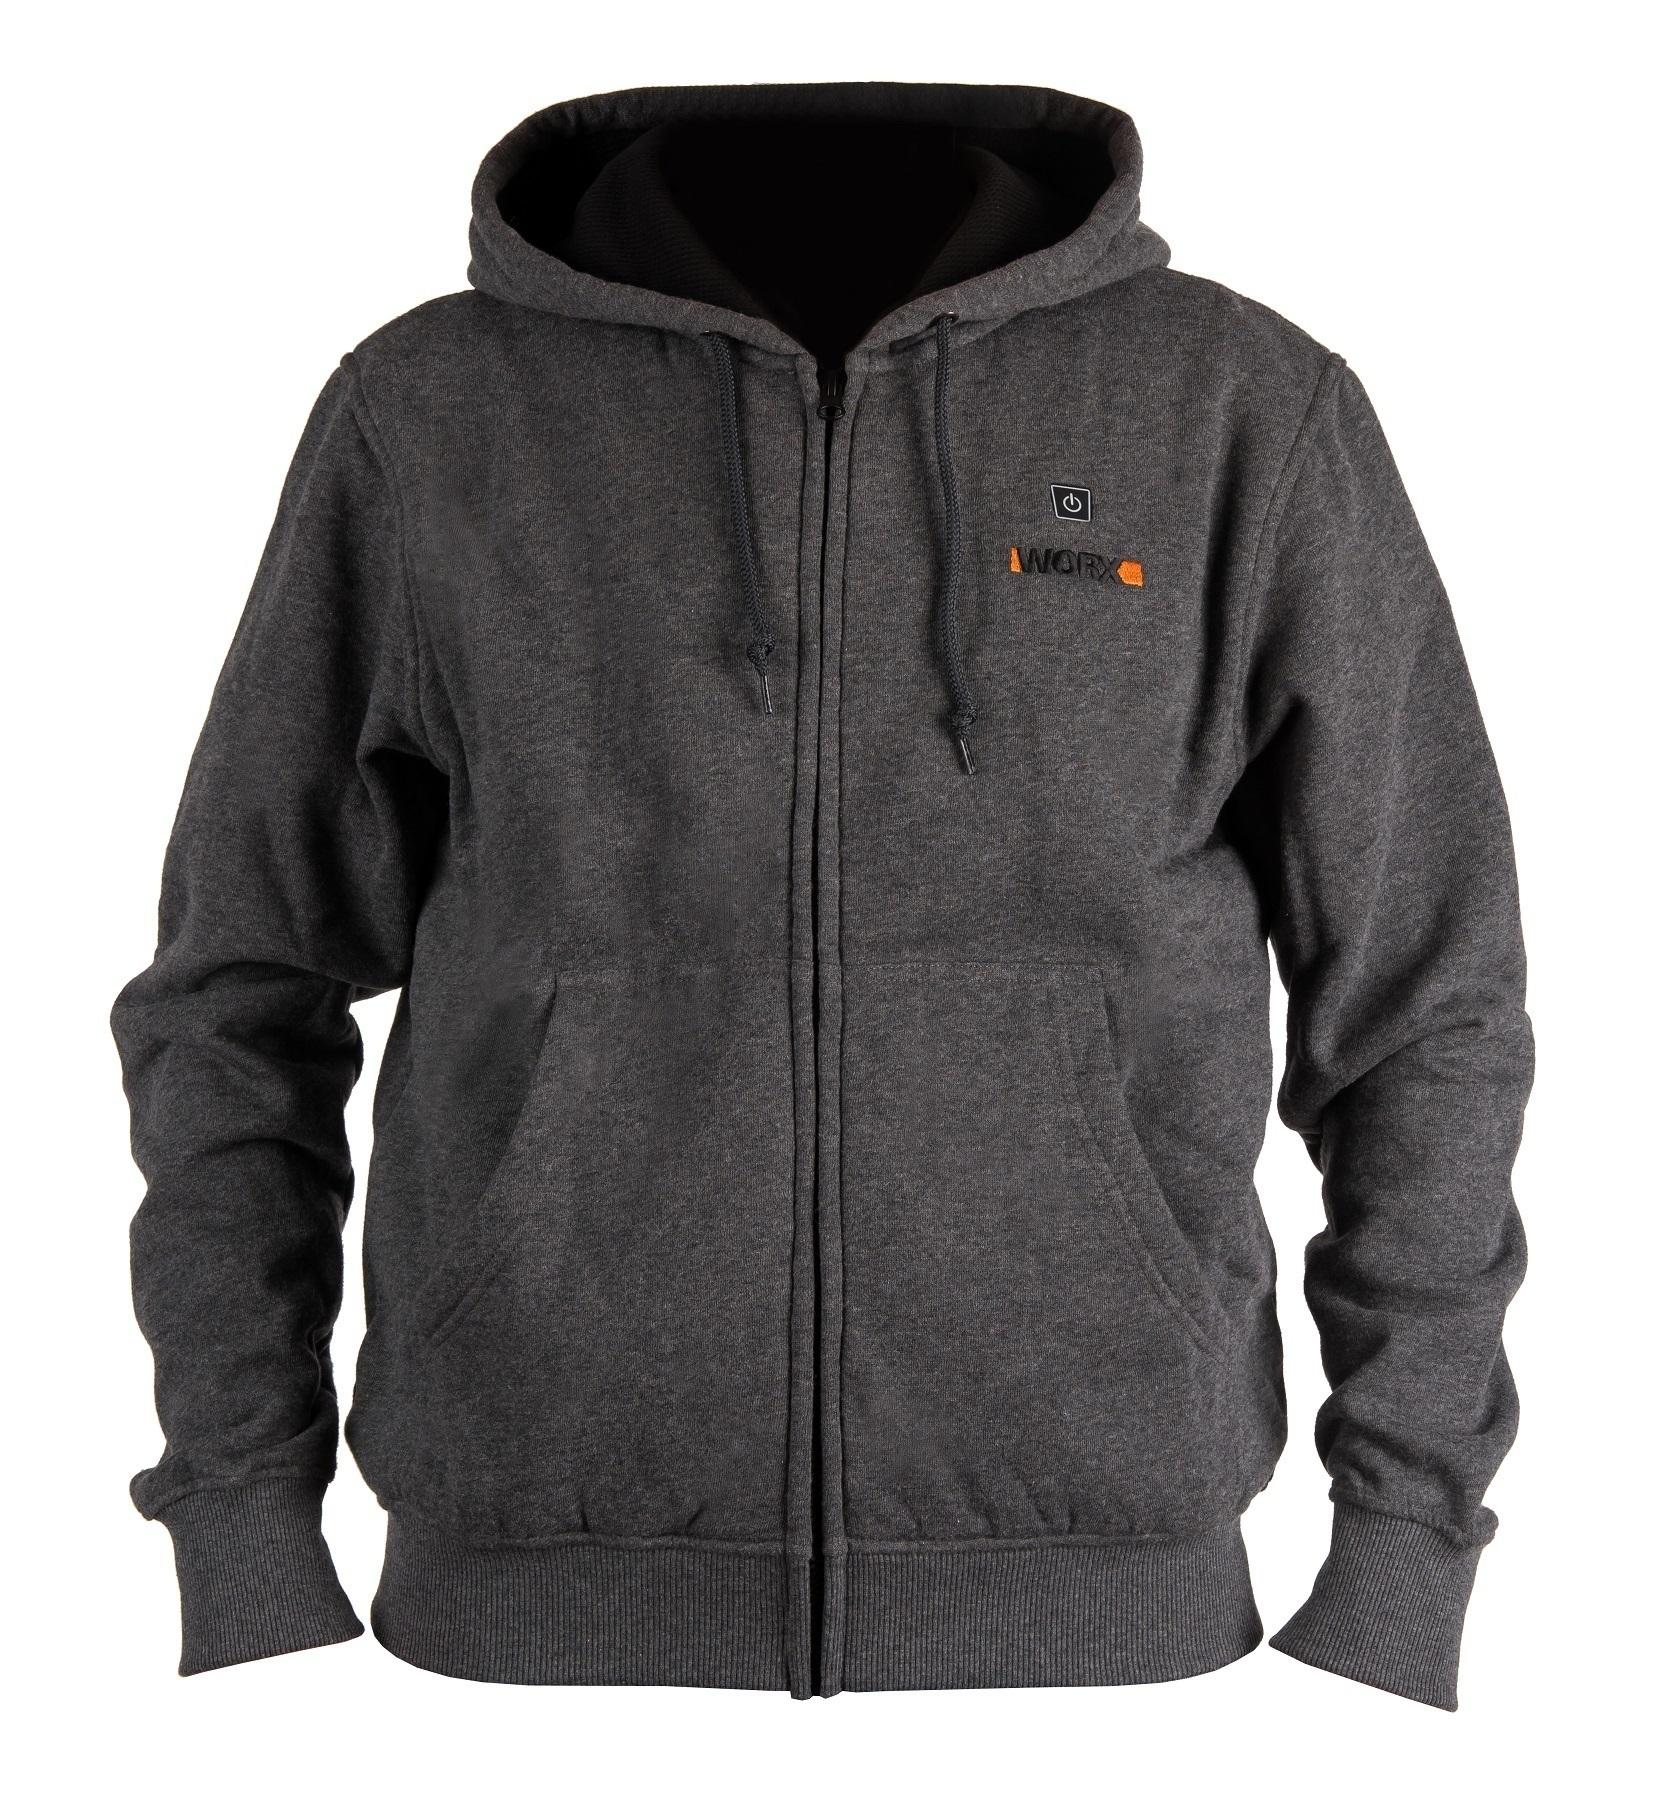 Куртка с подогревом Worx WA4660 XL темно-серая